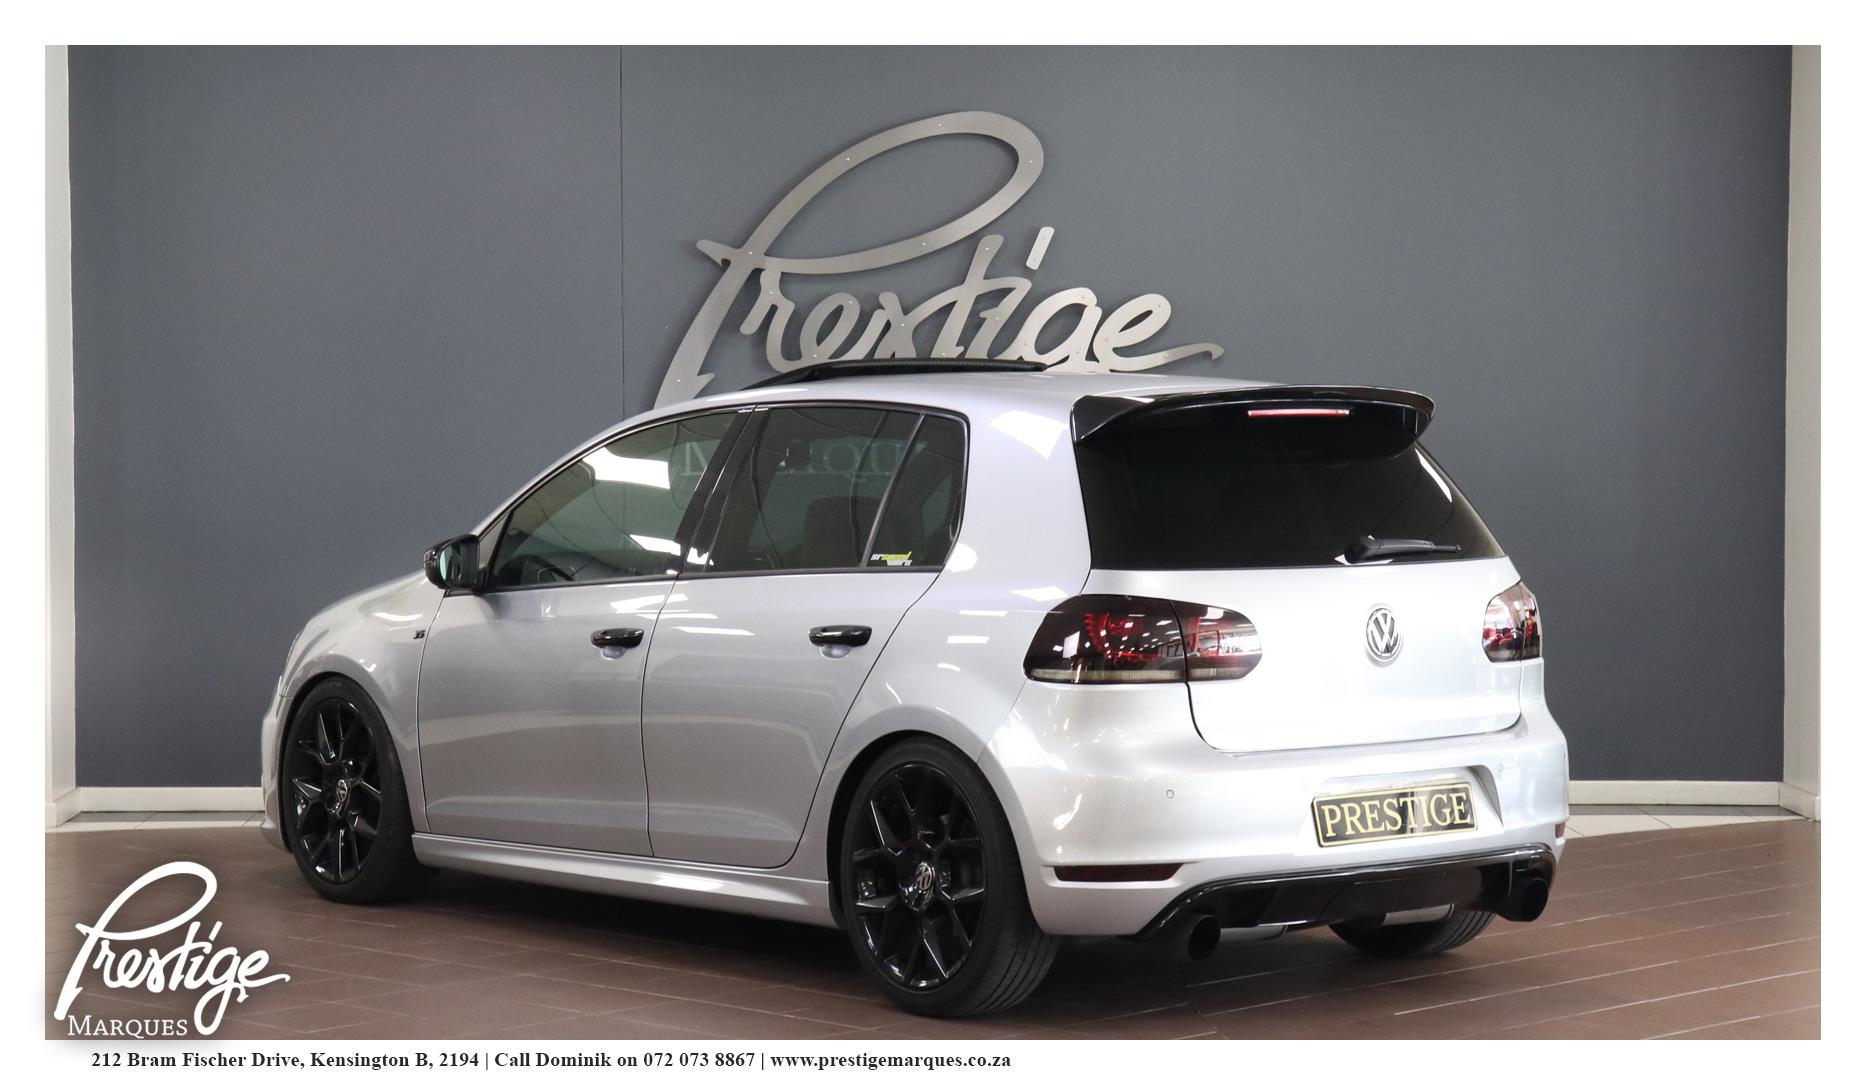 2013-Volkswagen-Golf-GTI-Ed 35-DSG-Prestige-Marques-Randburg-Sandton-6